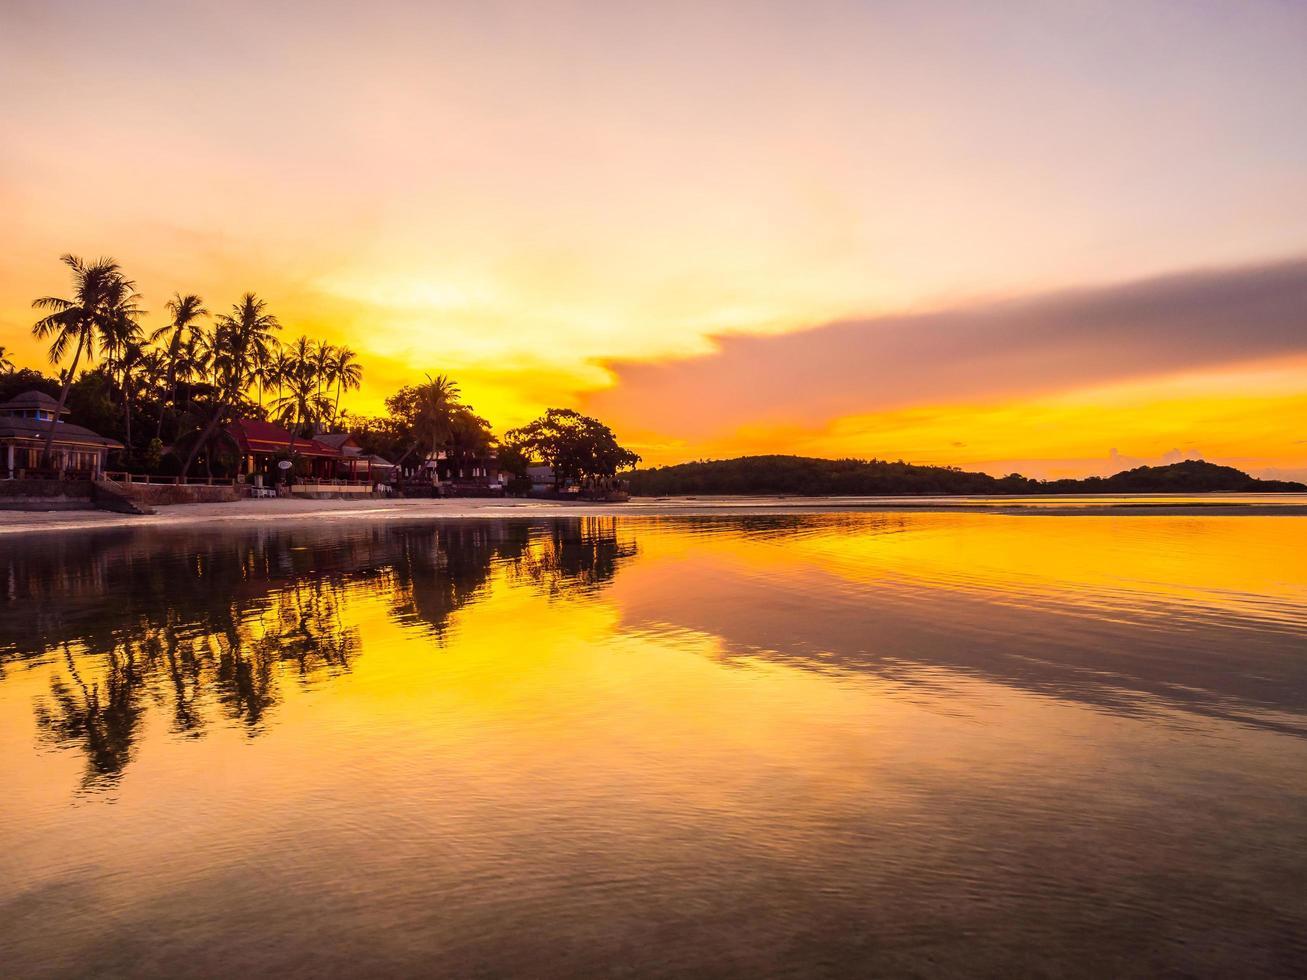 prachtig tropisch strand bij zonsopgang foto